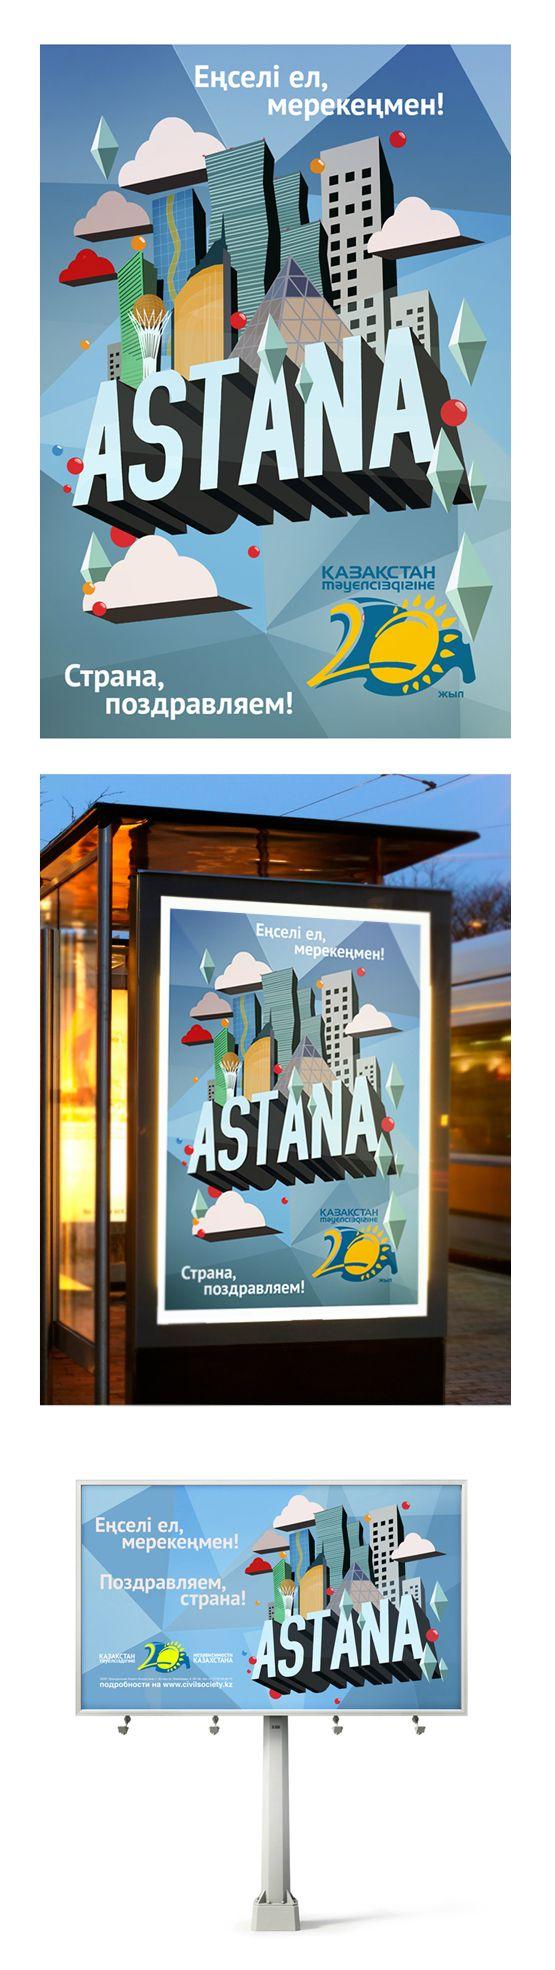 http://timagoofy.kz/#astana